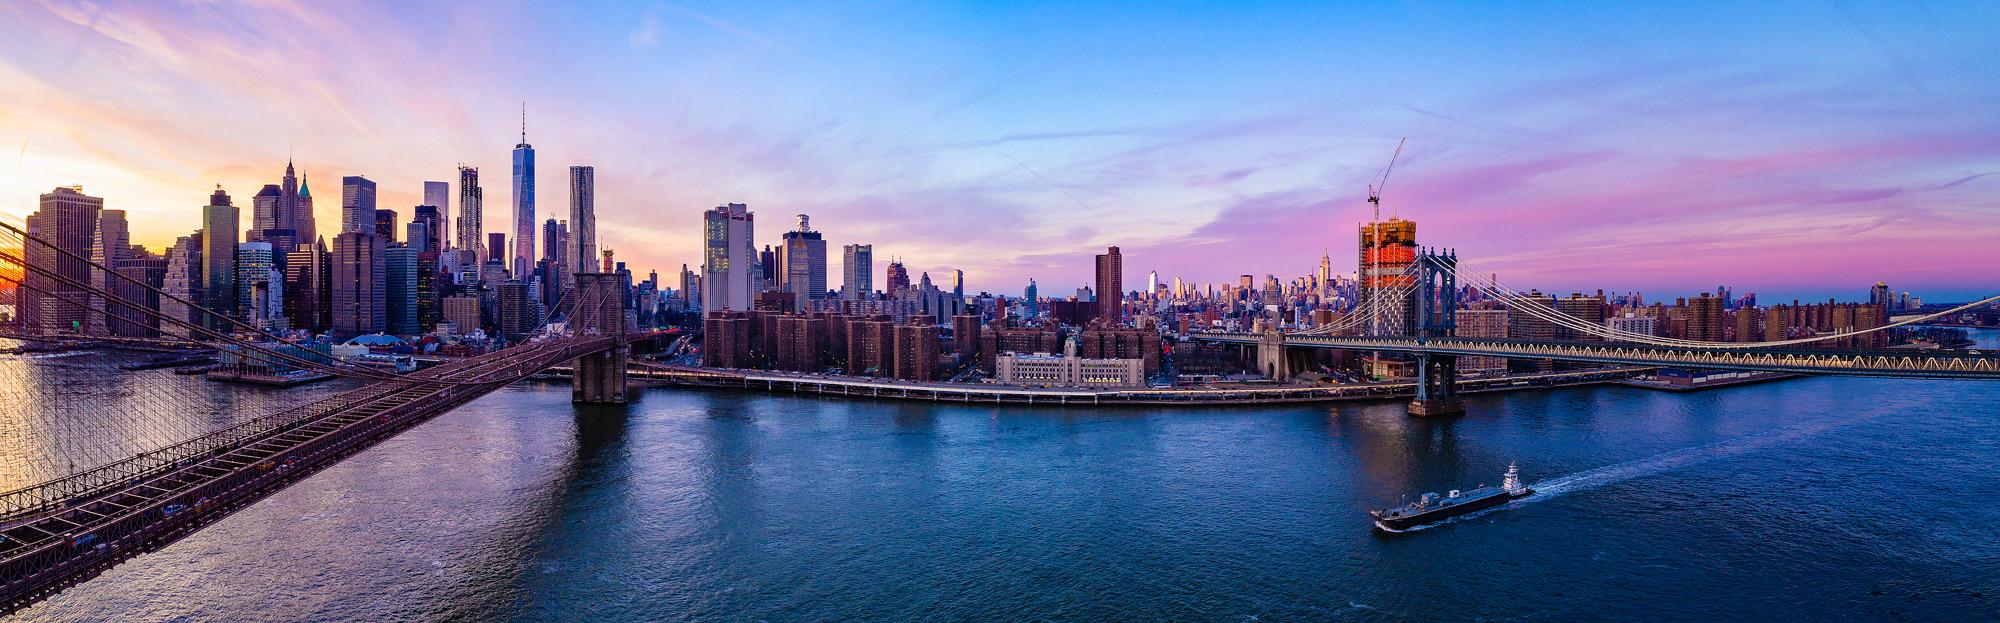 Manhattan Cityscape at Sunset